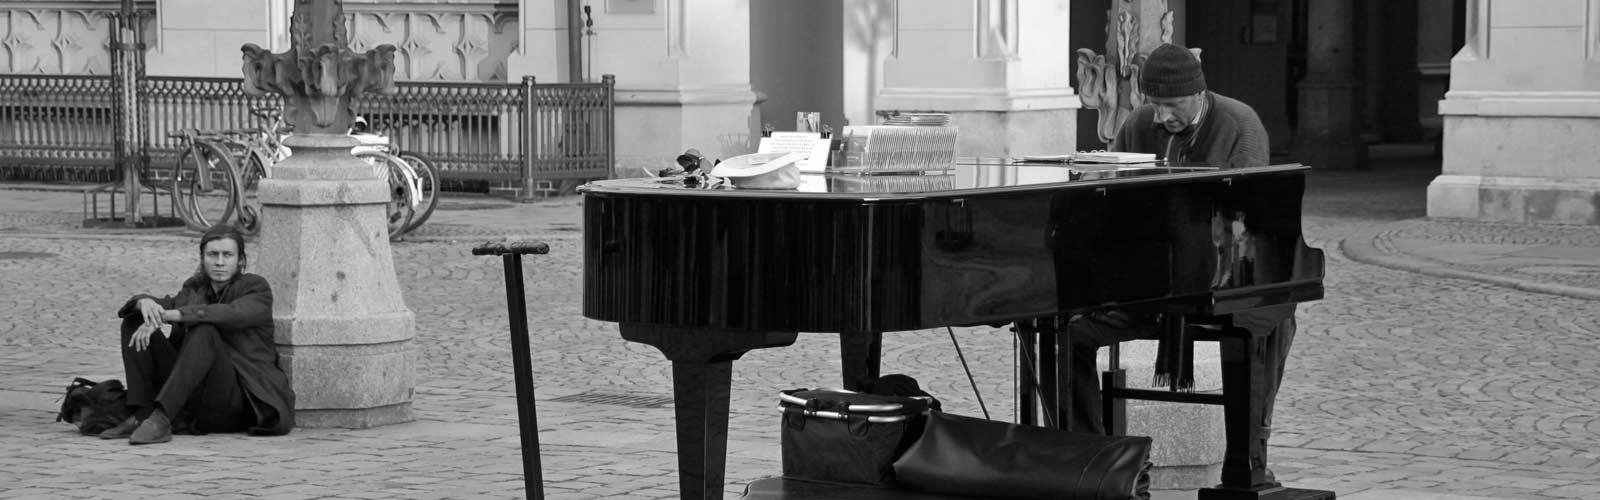 cours-de-piano-Angers-4